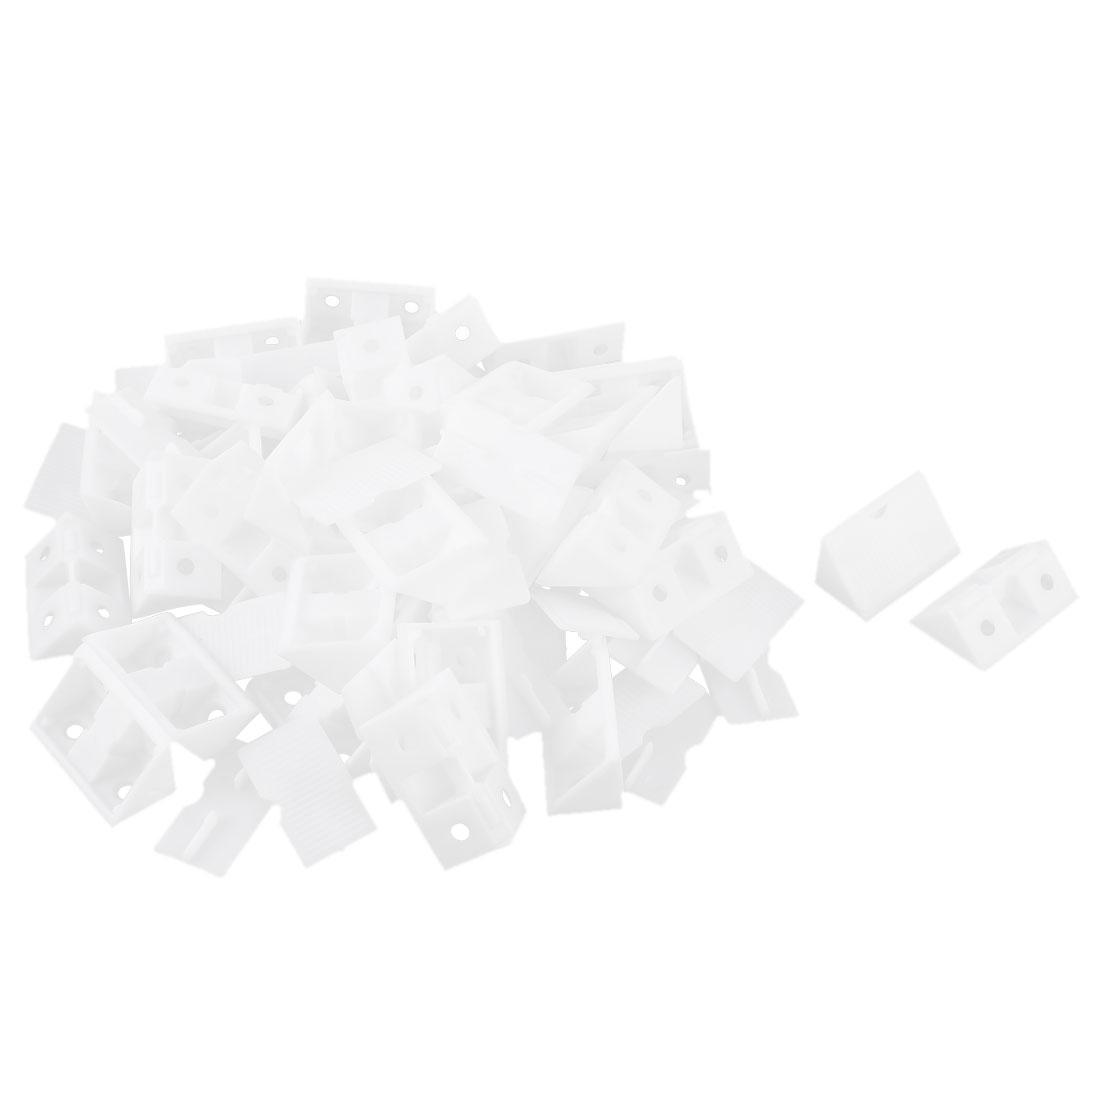 Shelf Cabinet Plastic Corner Braces Angle Brackets White 40pcs